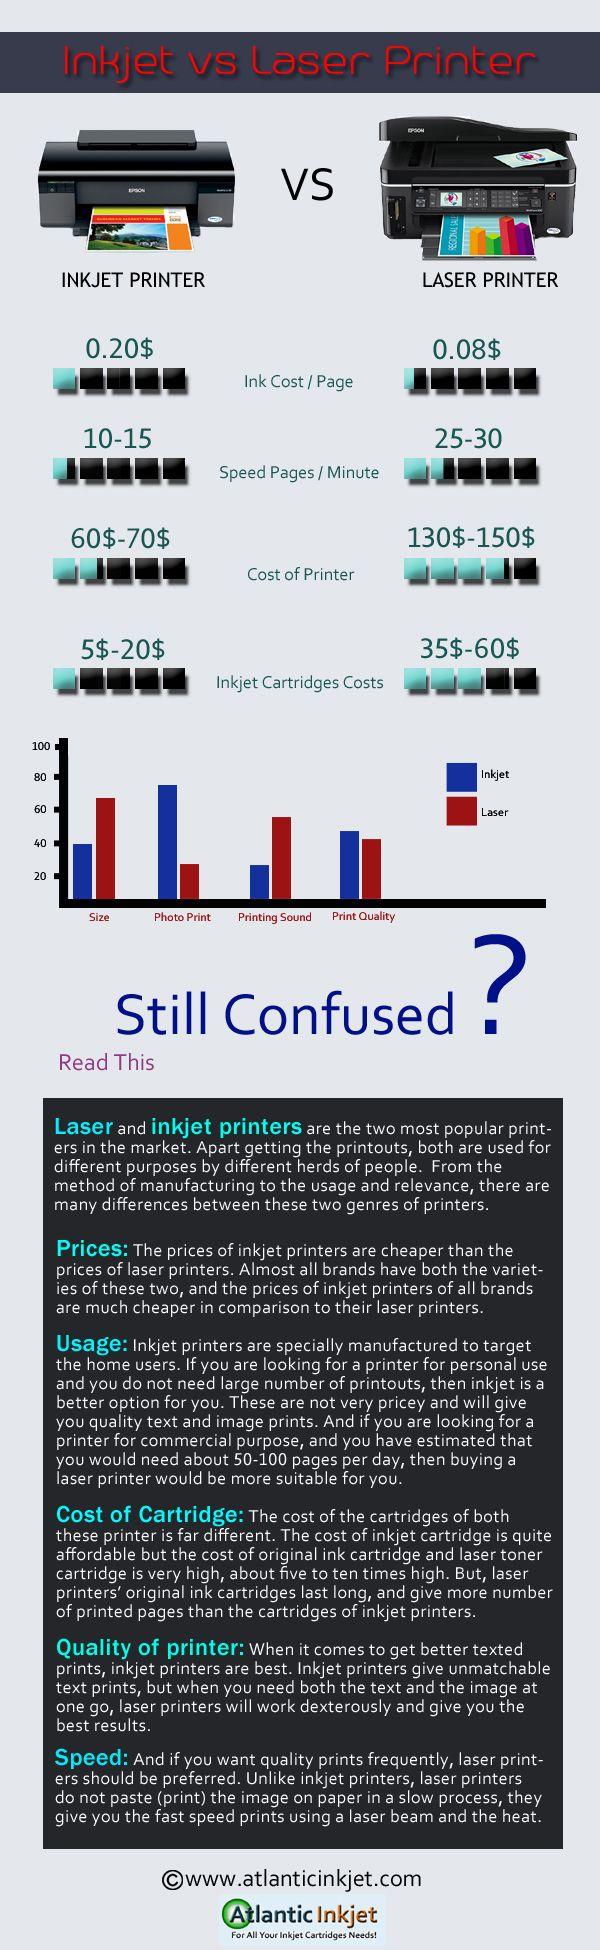 Color printing inkjet vs laser - Cool Info Graphic On Inkjet Printer Vs Laser Printer Check Out Our Blog Infographic